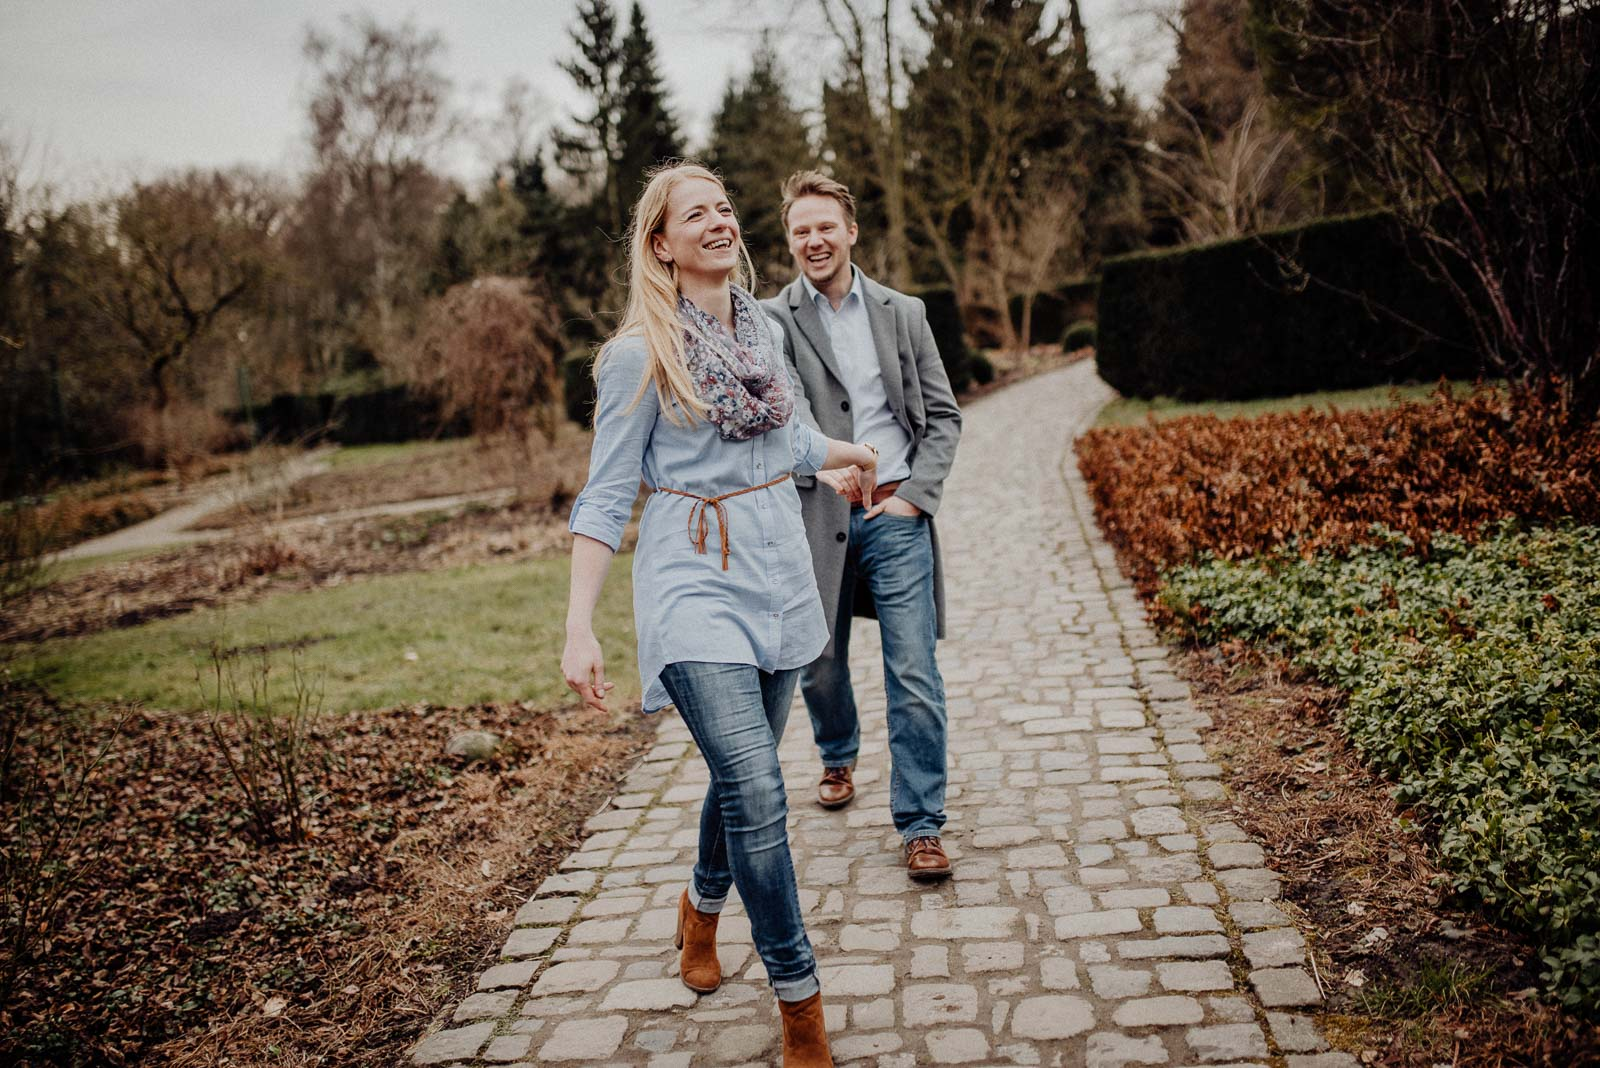 040-verlobungsshooting-engagement-fotograf-witten-rombergpark-dortmund